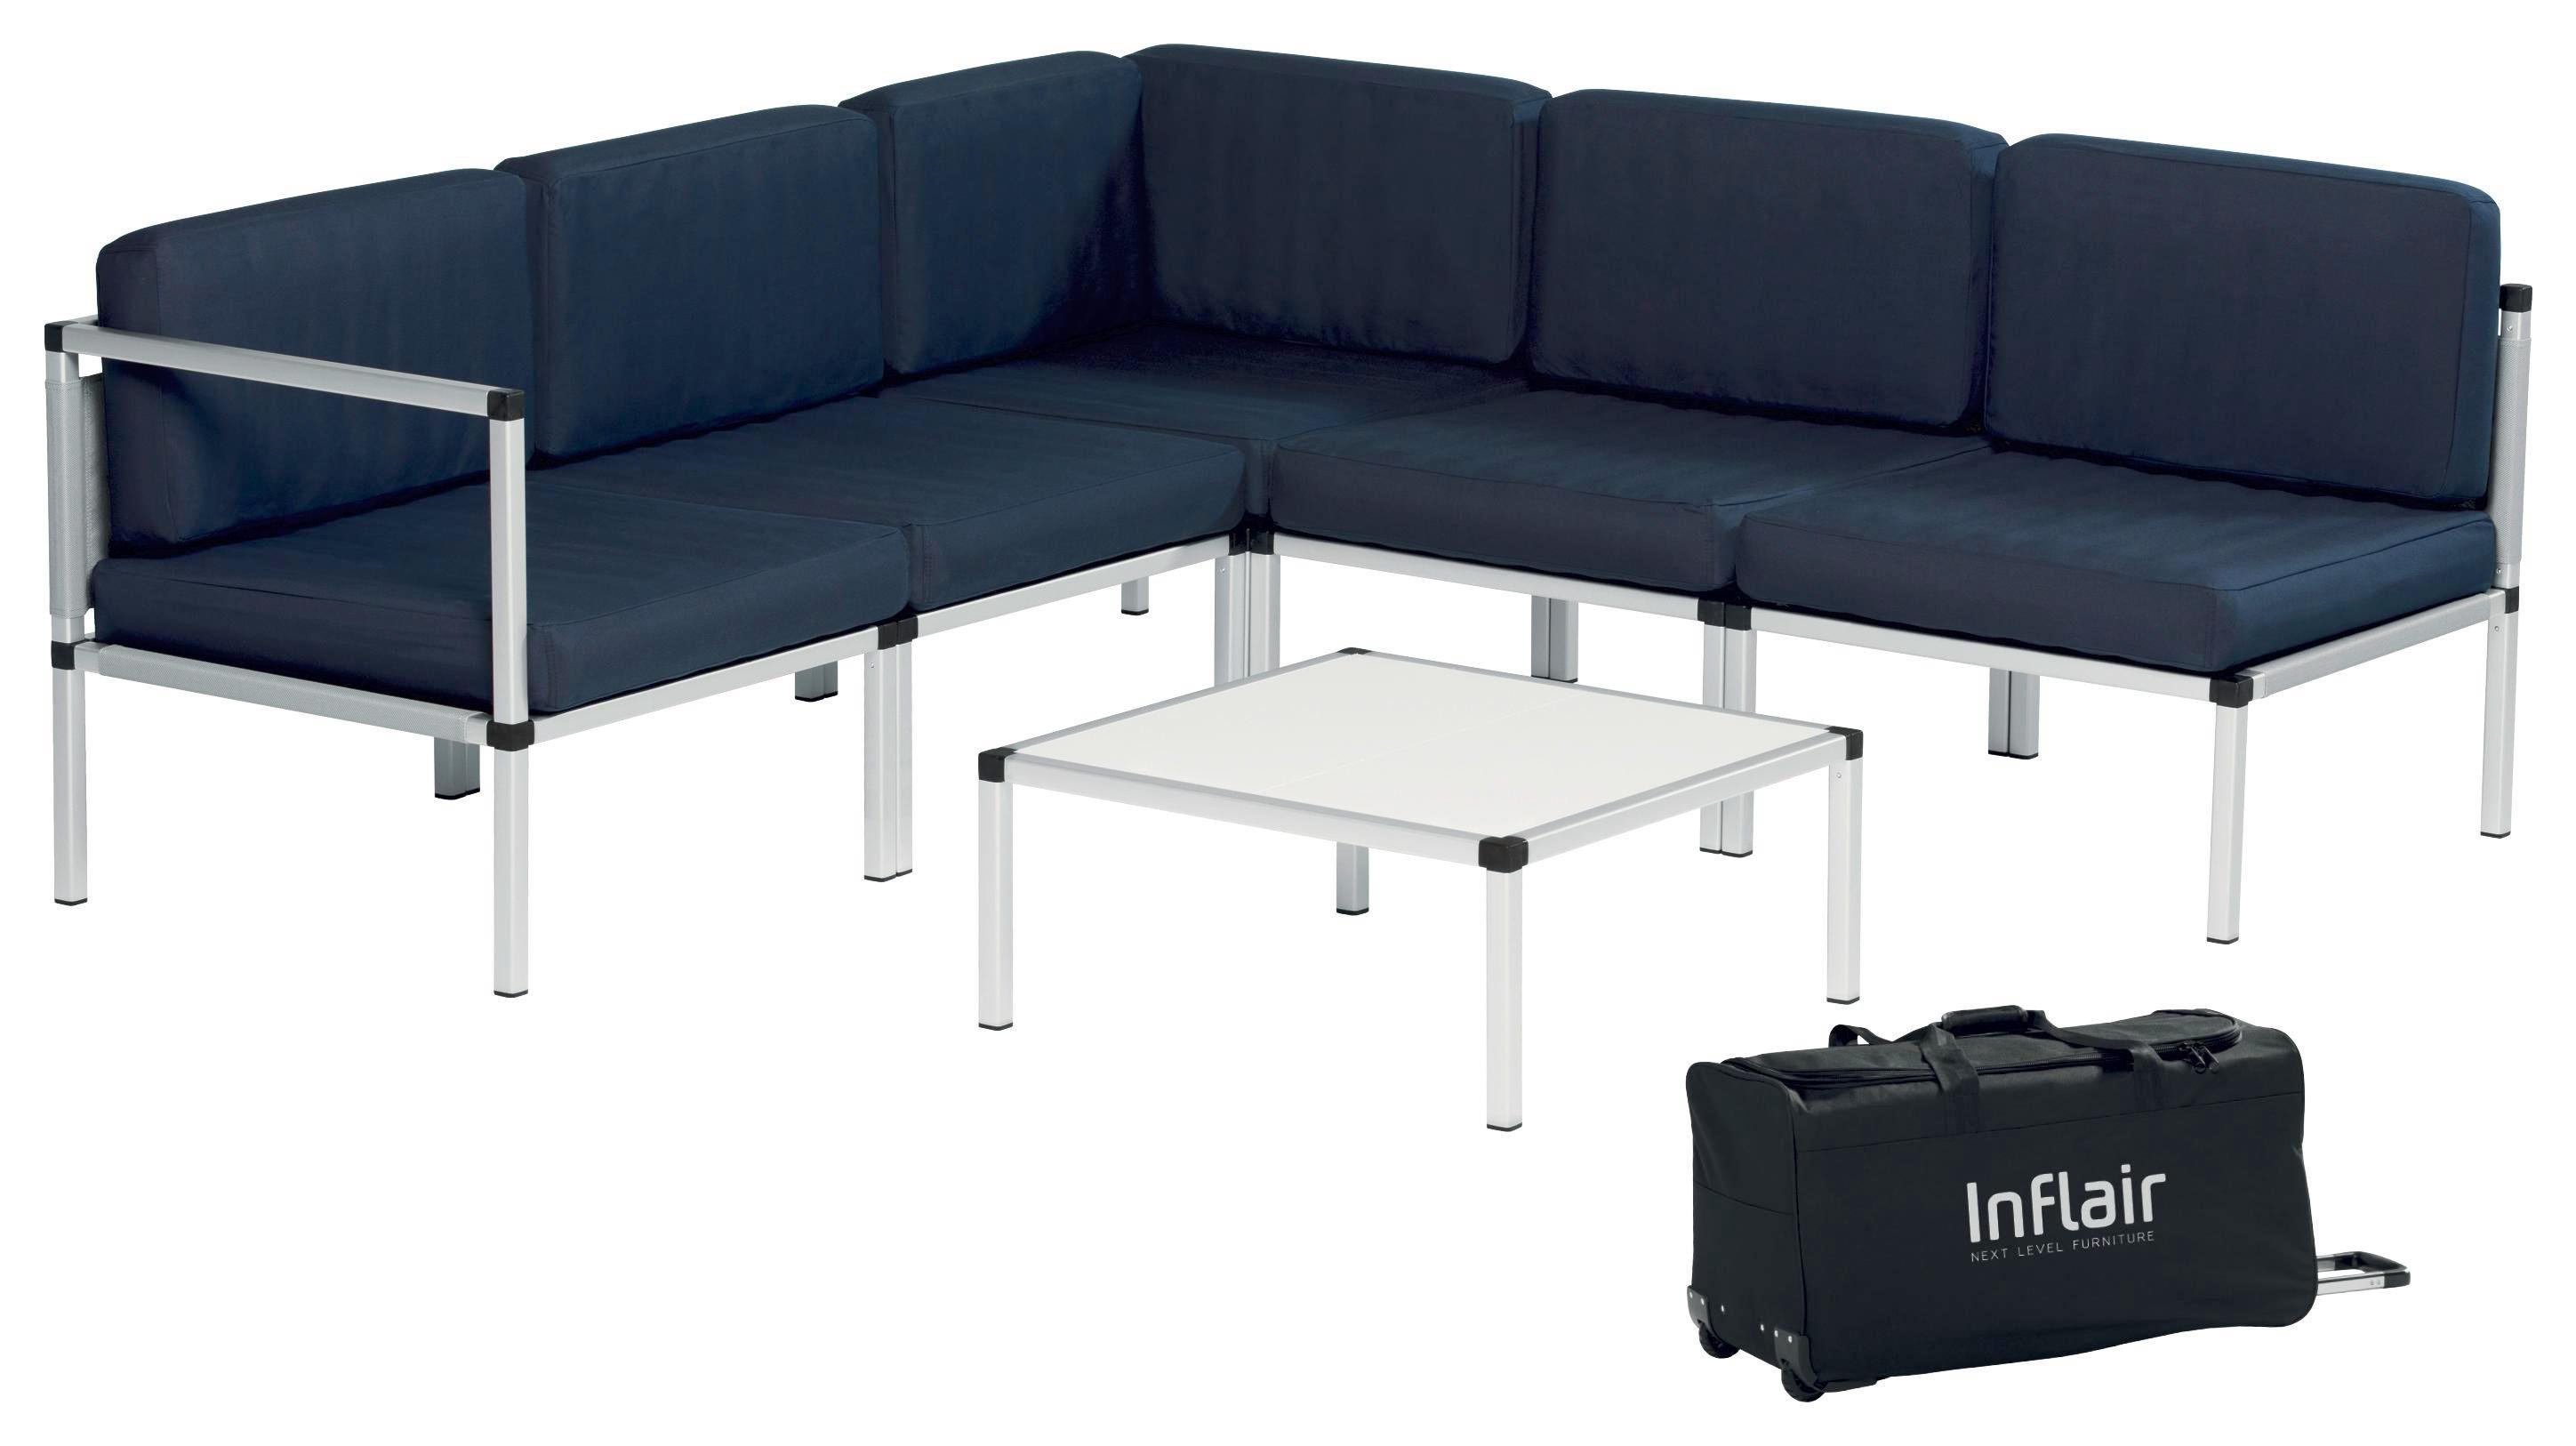 LOUNGEGARNITUR 19-teilig - Alufarben/Dunkelblau, Design, Textil/Metall (210/210cm)